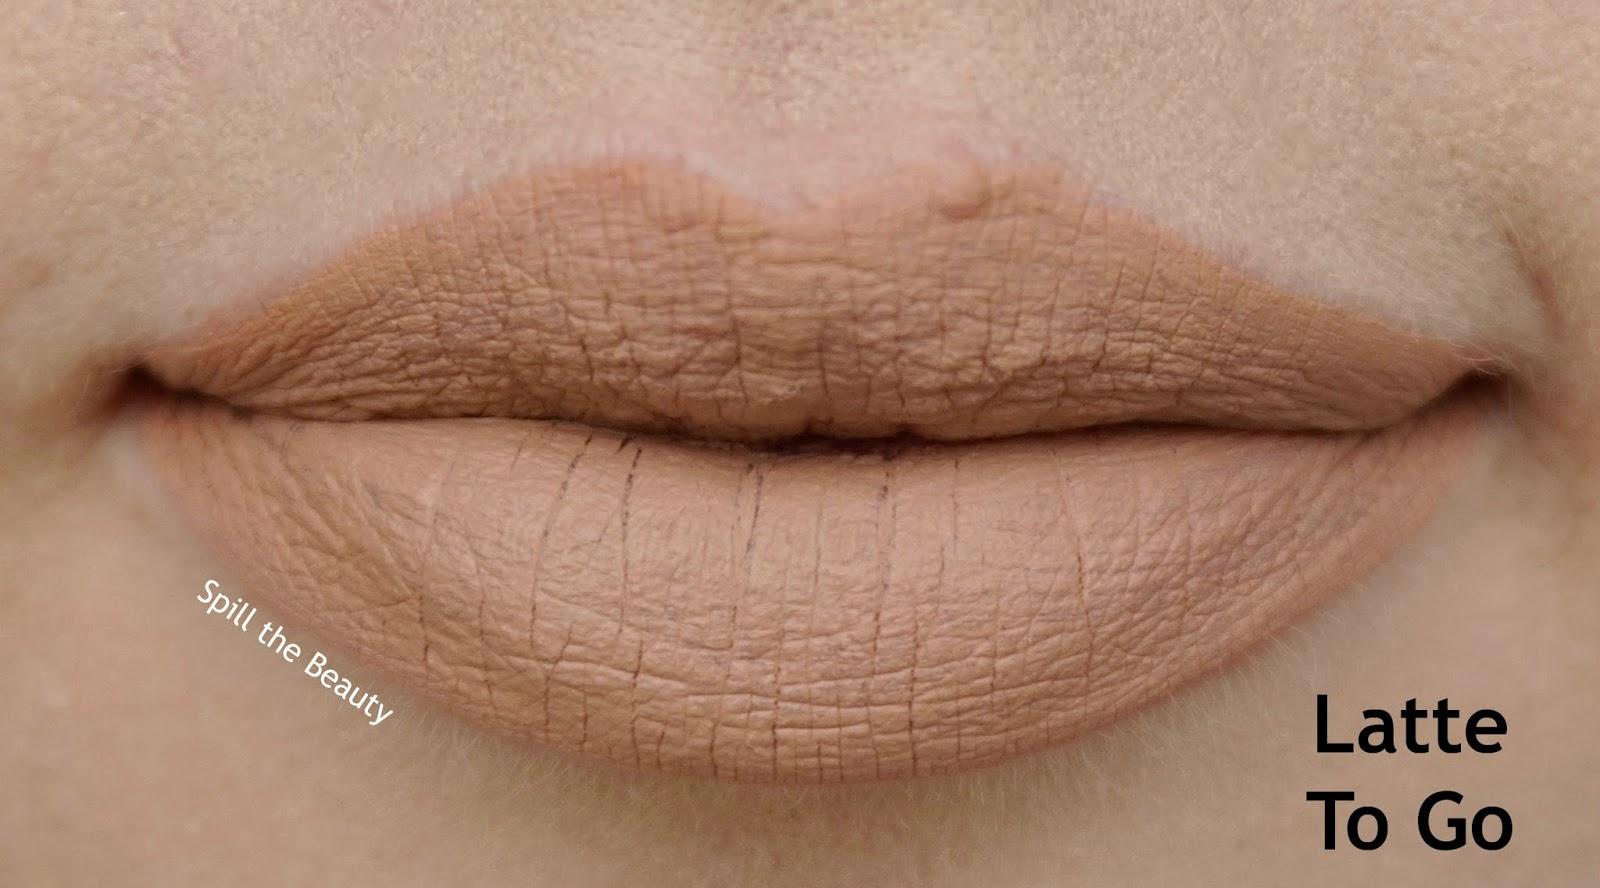 rimmel london stay matte liquid lip color review swatches 710 latte to go